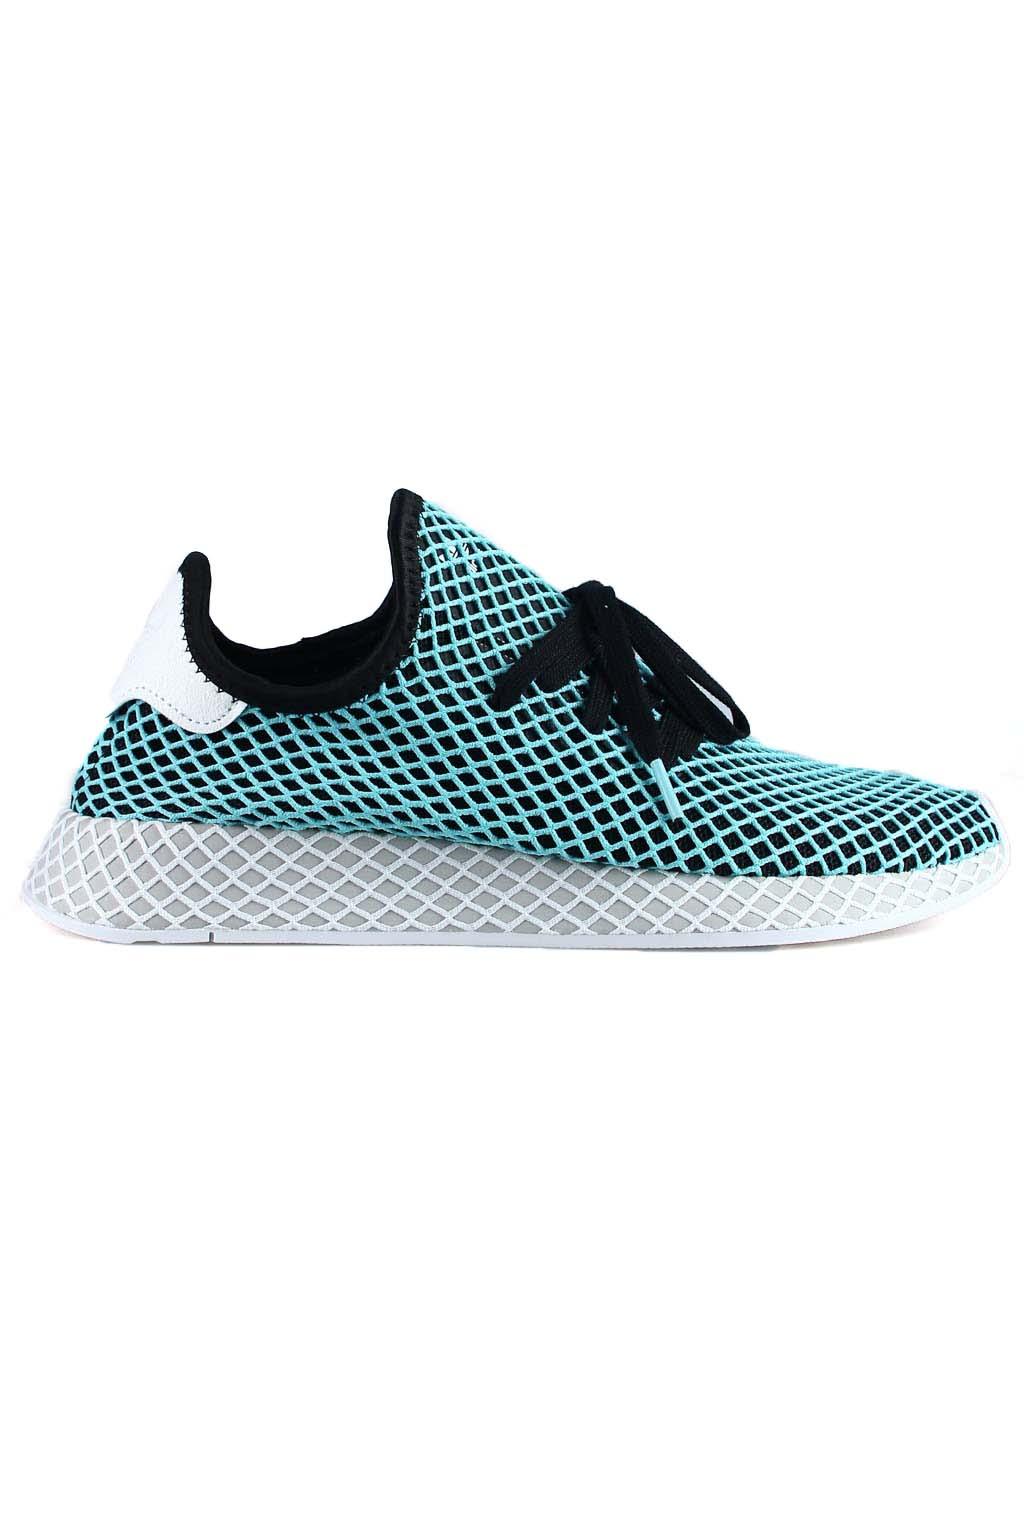 competitive price c9fd3 1d003 Adidas Deerupt Runner Parley - Black CQ2623